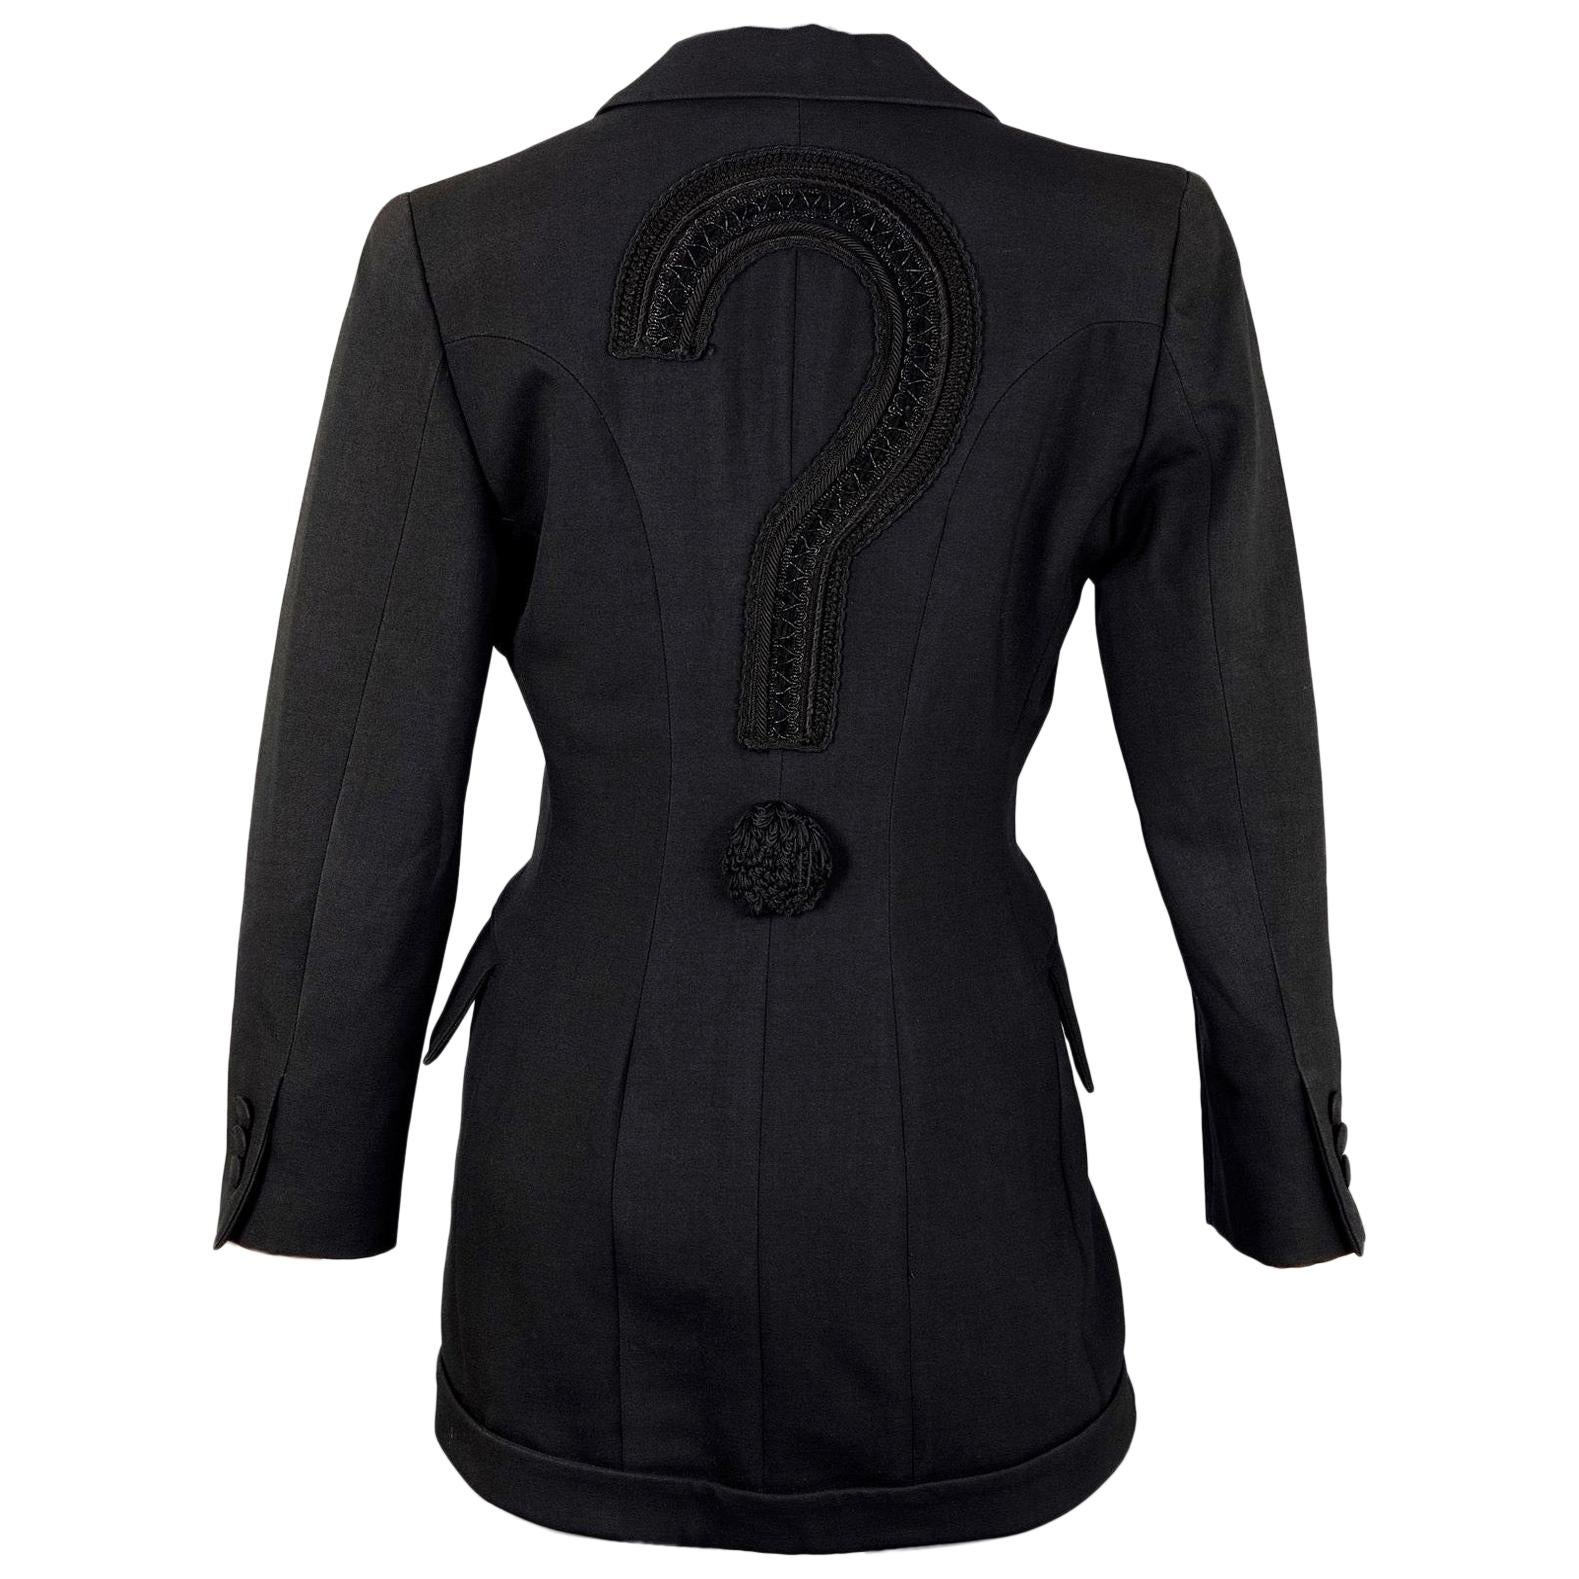 MOSCHINO Upside Down Collar Passementerie Pompom Question Mark Blazer Jacket